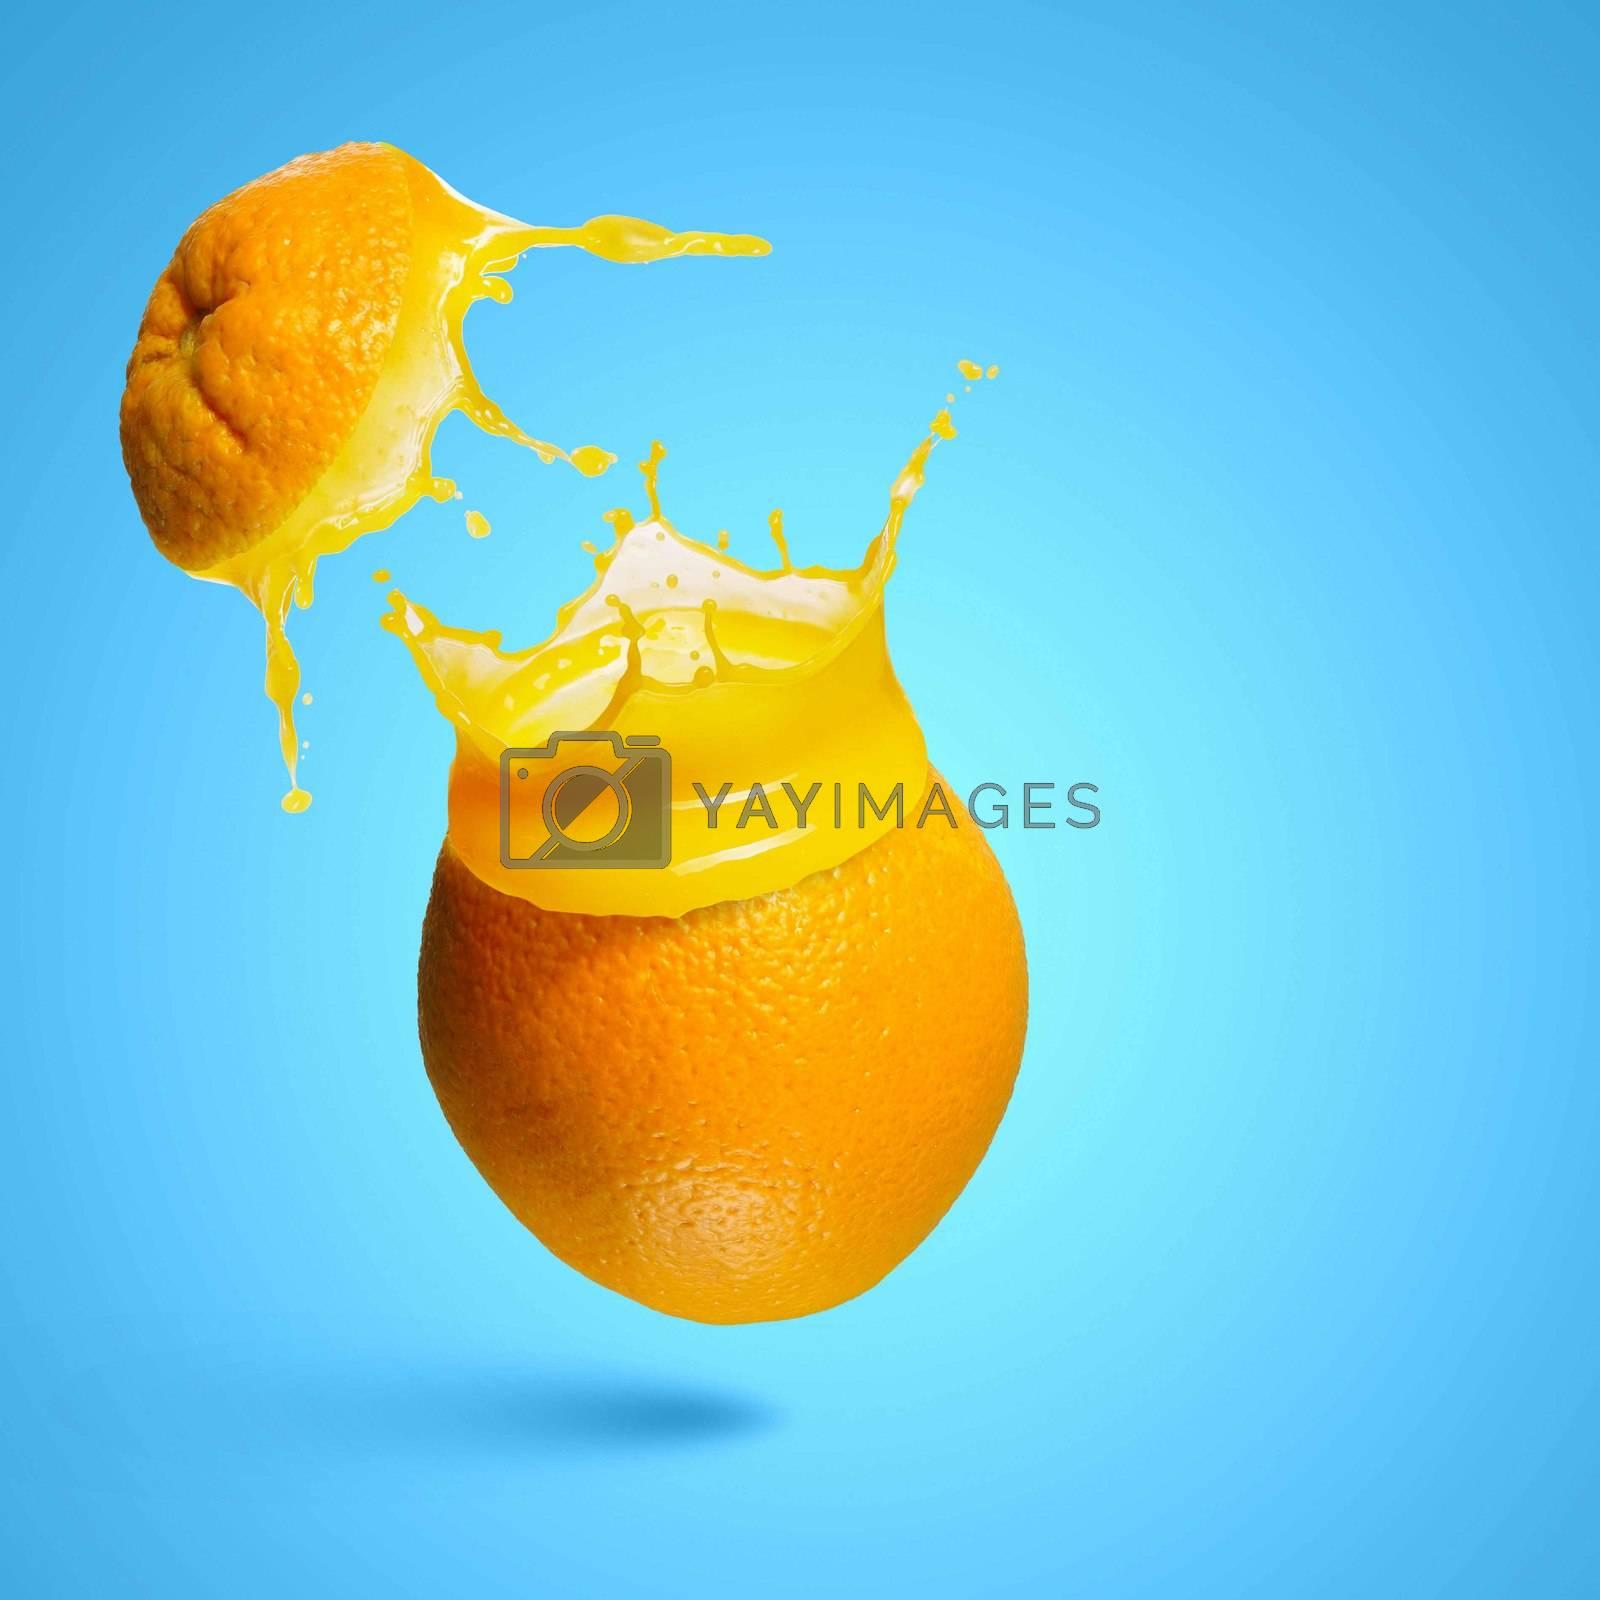 Royalty free image of Orange juice by sergey_nivens